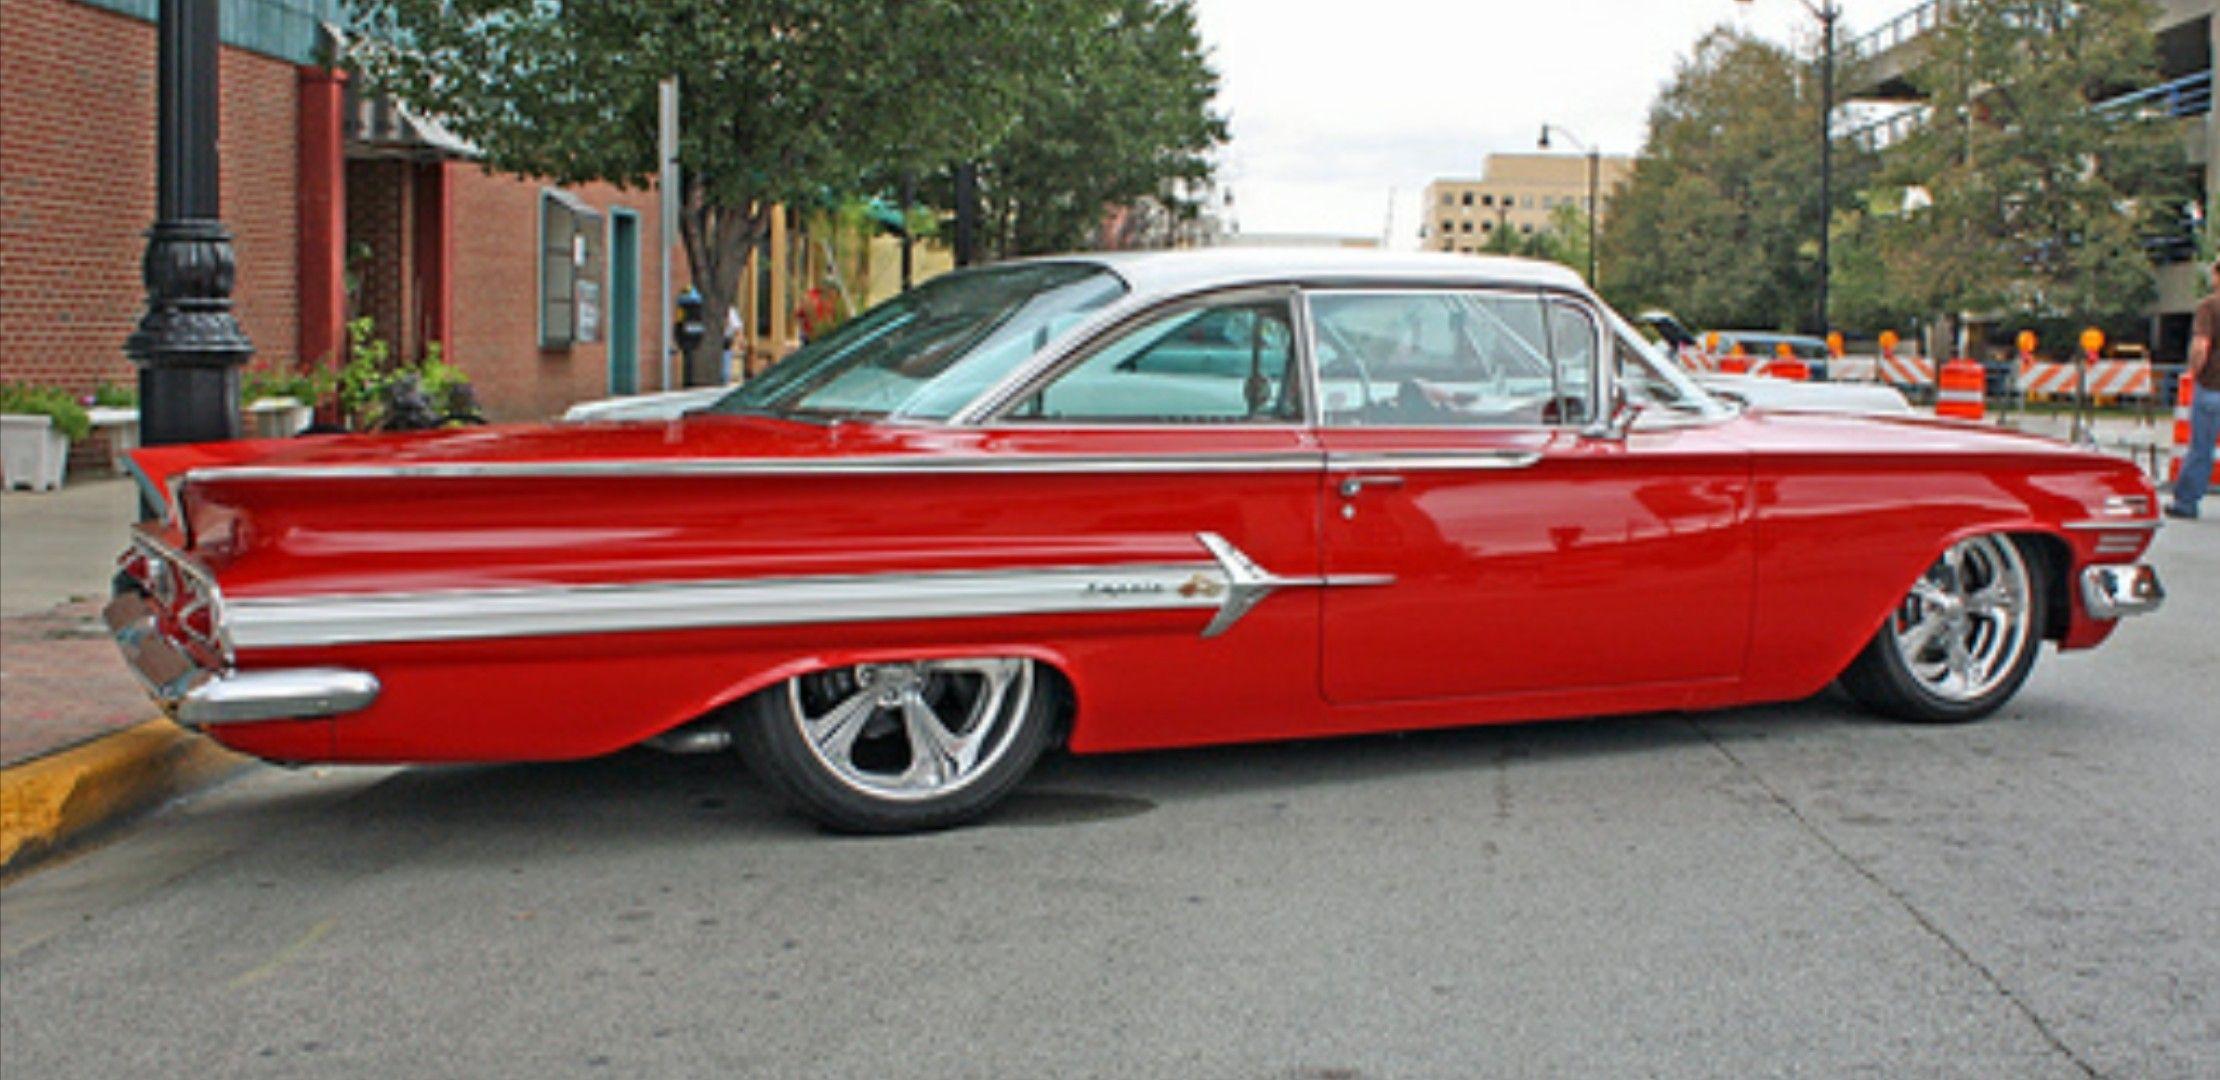 hight resolution of  59 impala